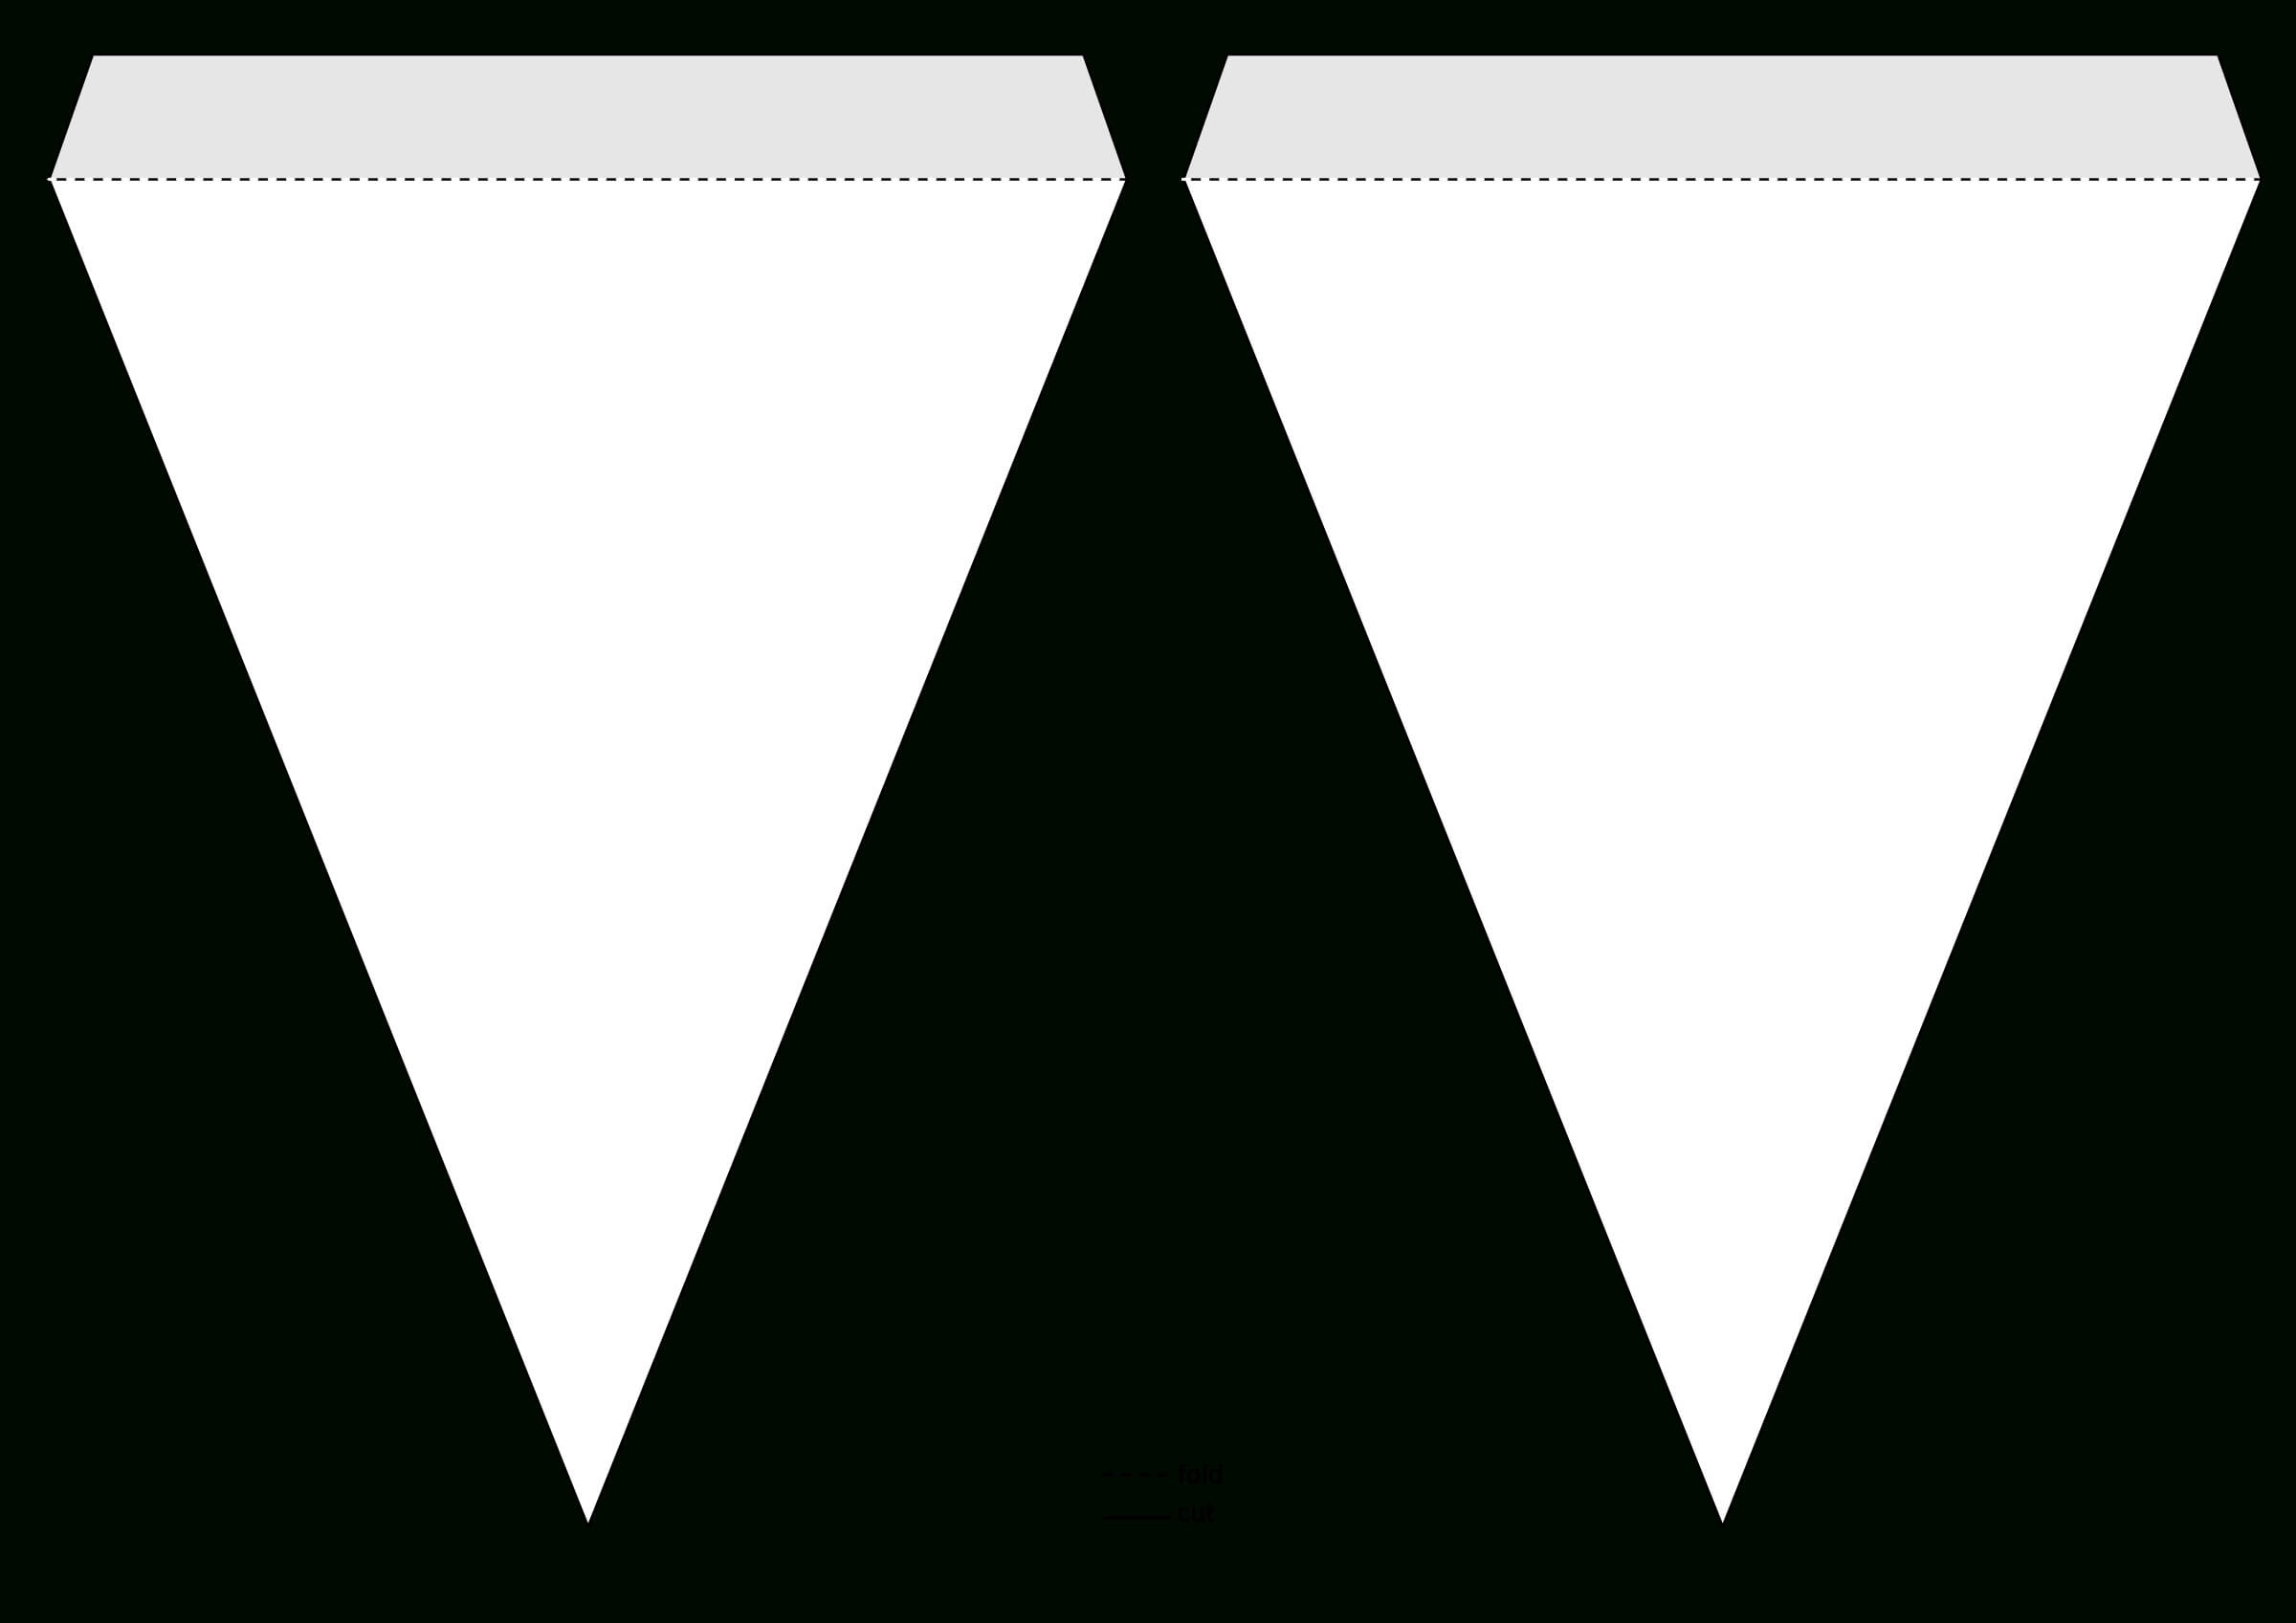 Triangle Pennant Banner Template@grafixgrrl, This Is A inside Triangle Pennant Banner Template